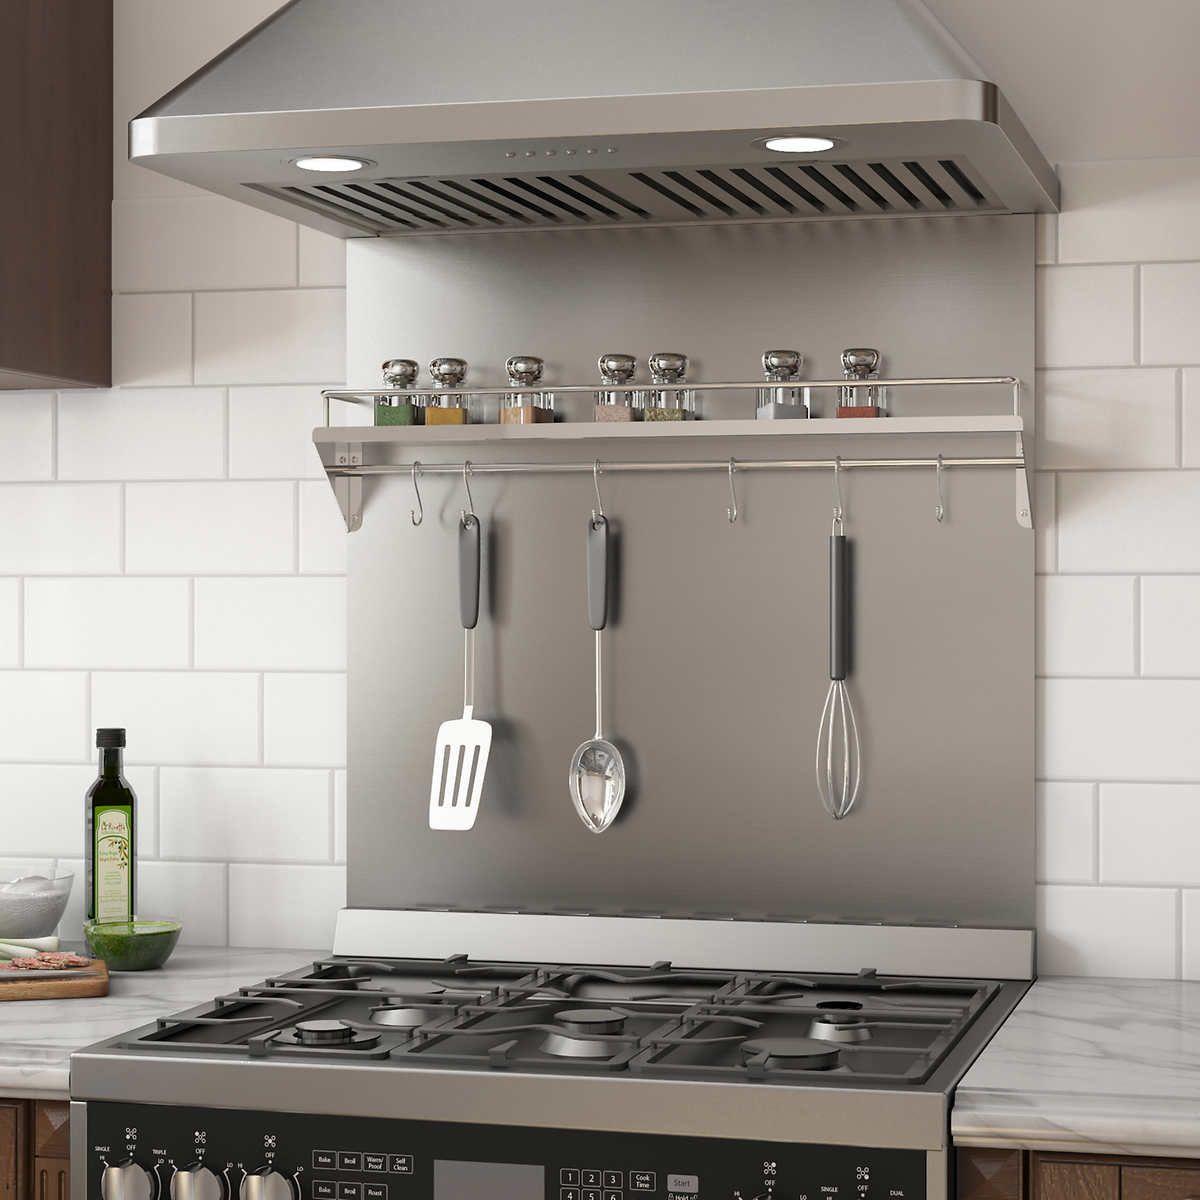 Ancona Stainless Steel Backsplash With Shelf And Rack Steel Backsplash Stainless Steel Kitchen Backsplash Stainless Steel Backsplash